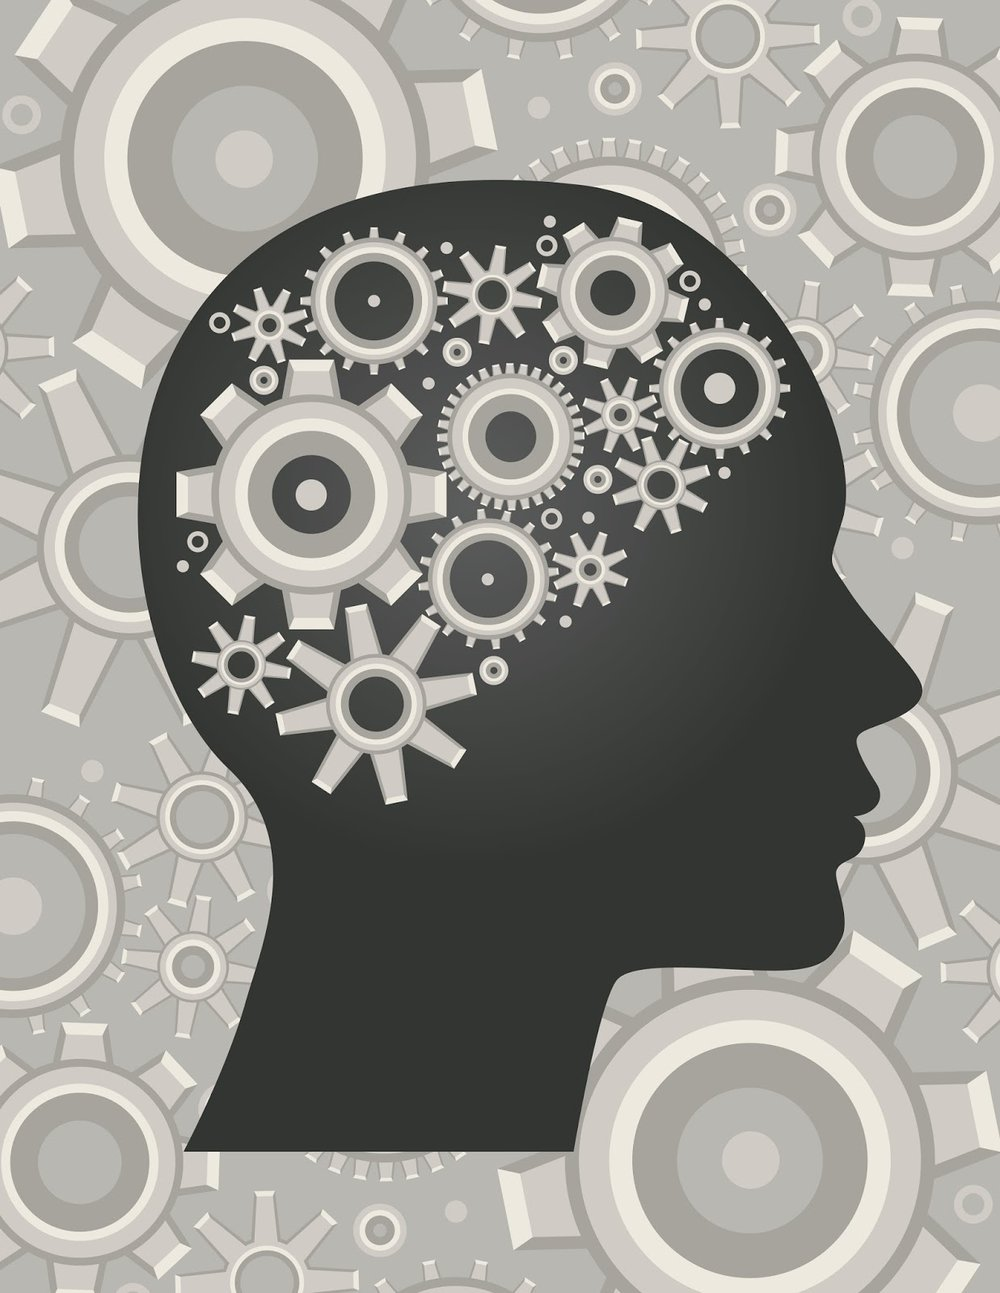 http://jafferys.org/sites/default/files/field/slideshow/Thought%20Process.jpg